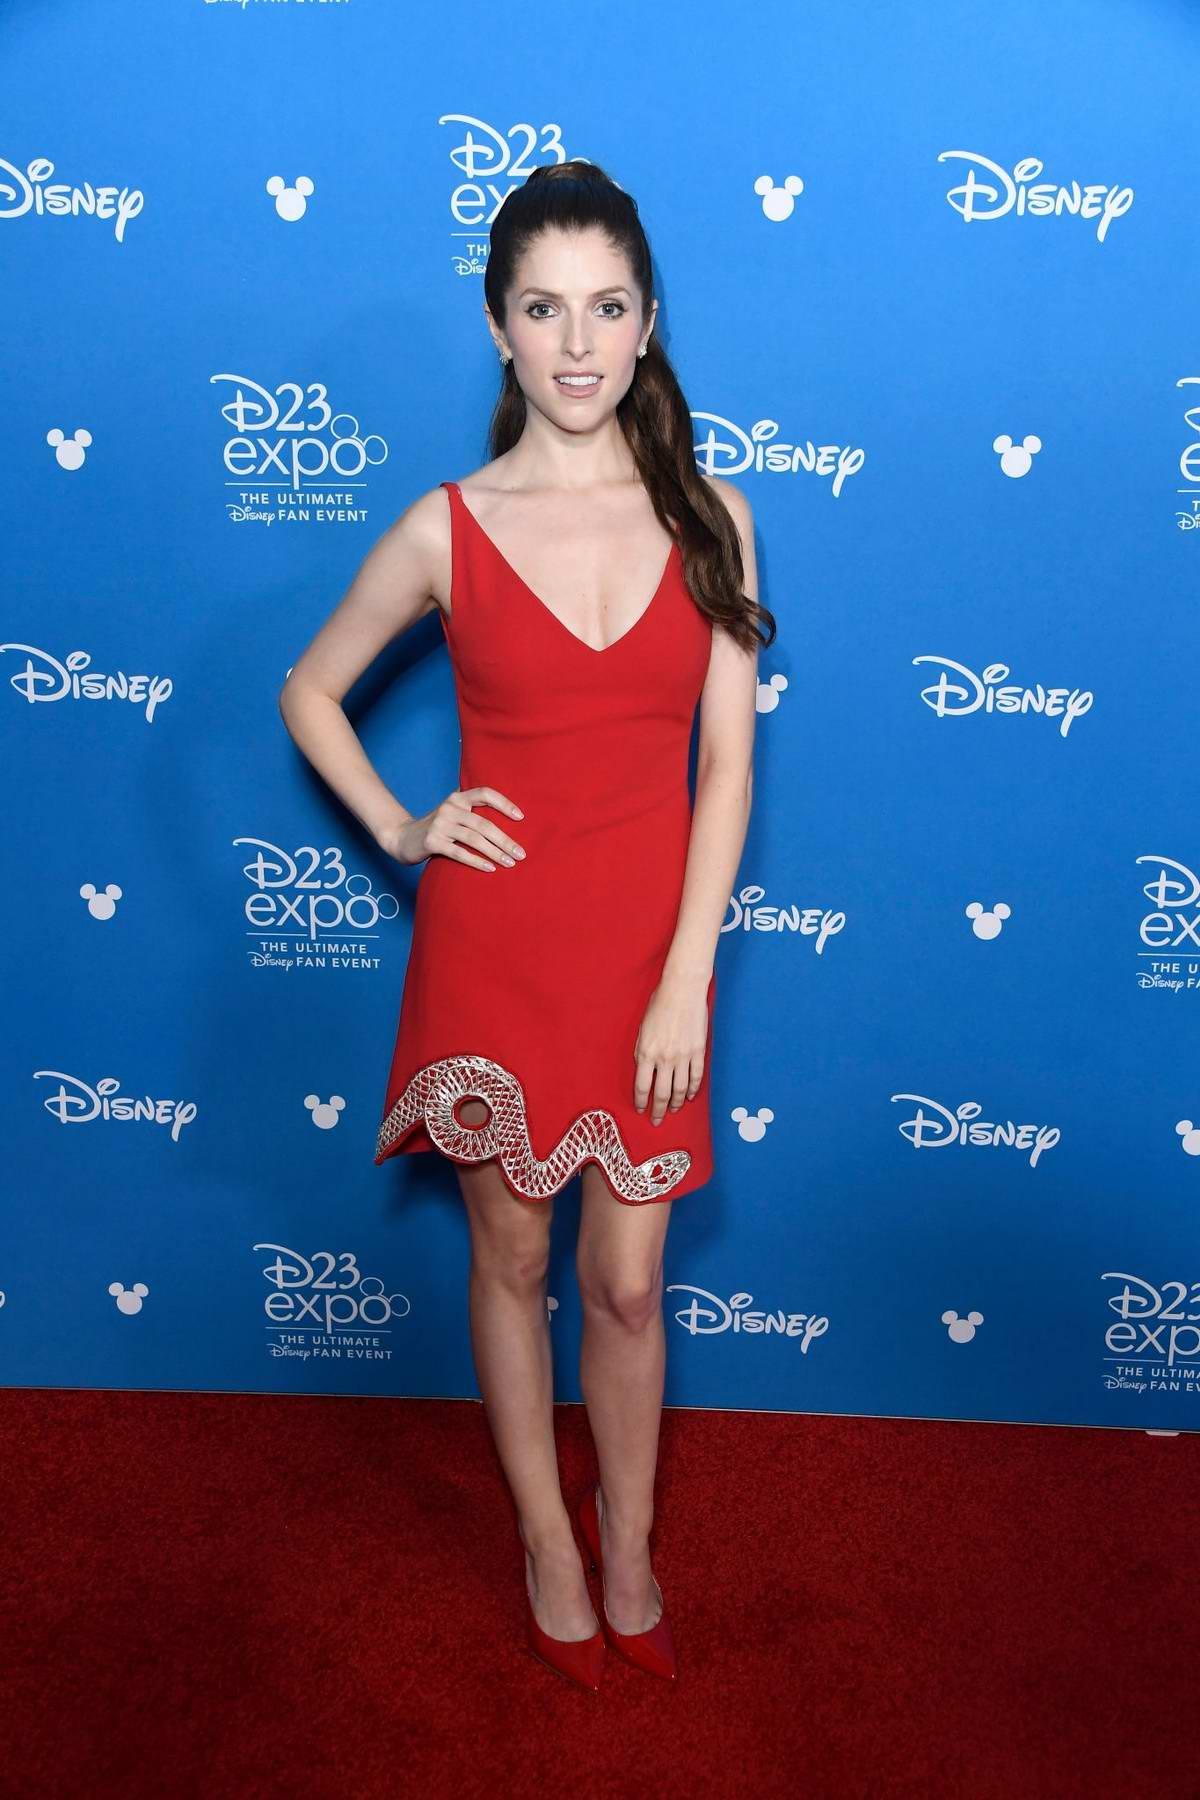 Anna Kendrick attends Disney D23 Expo 2019 at Anaheim Convention Center in Anaheim, California